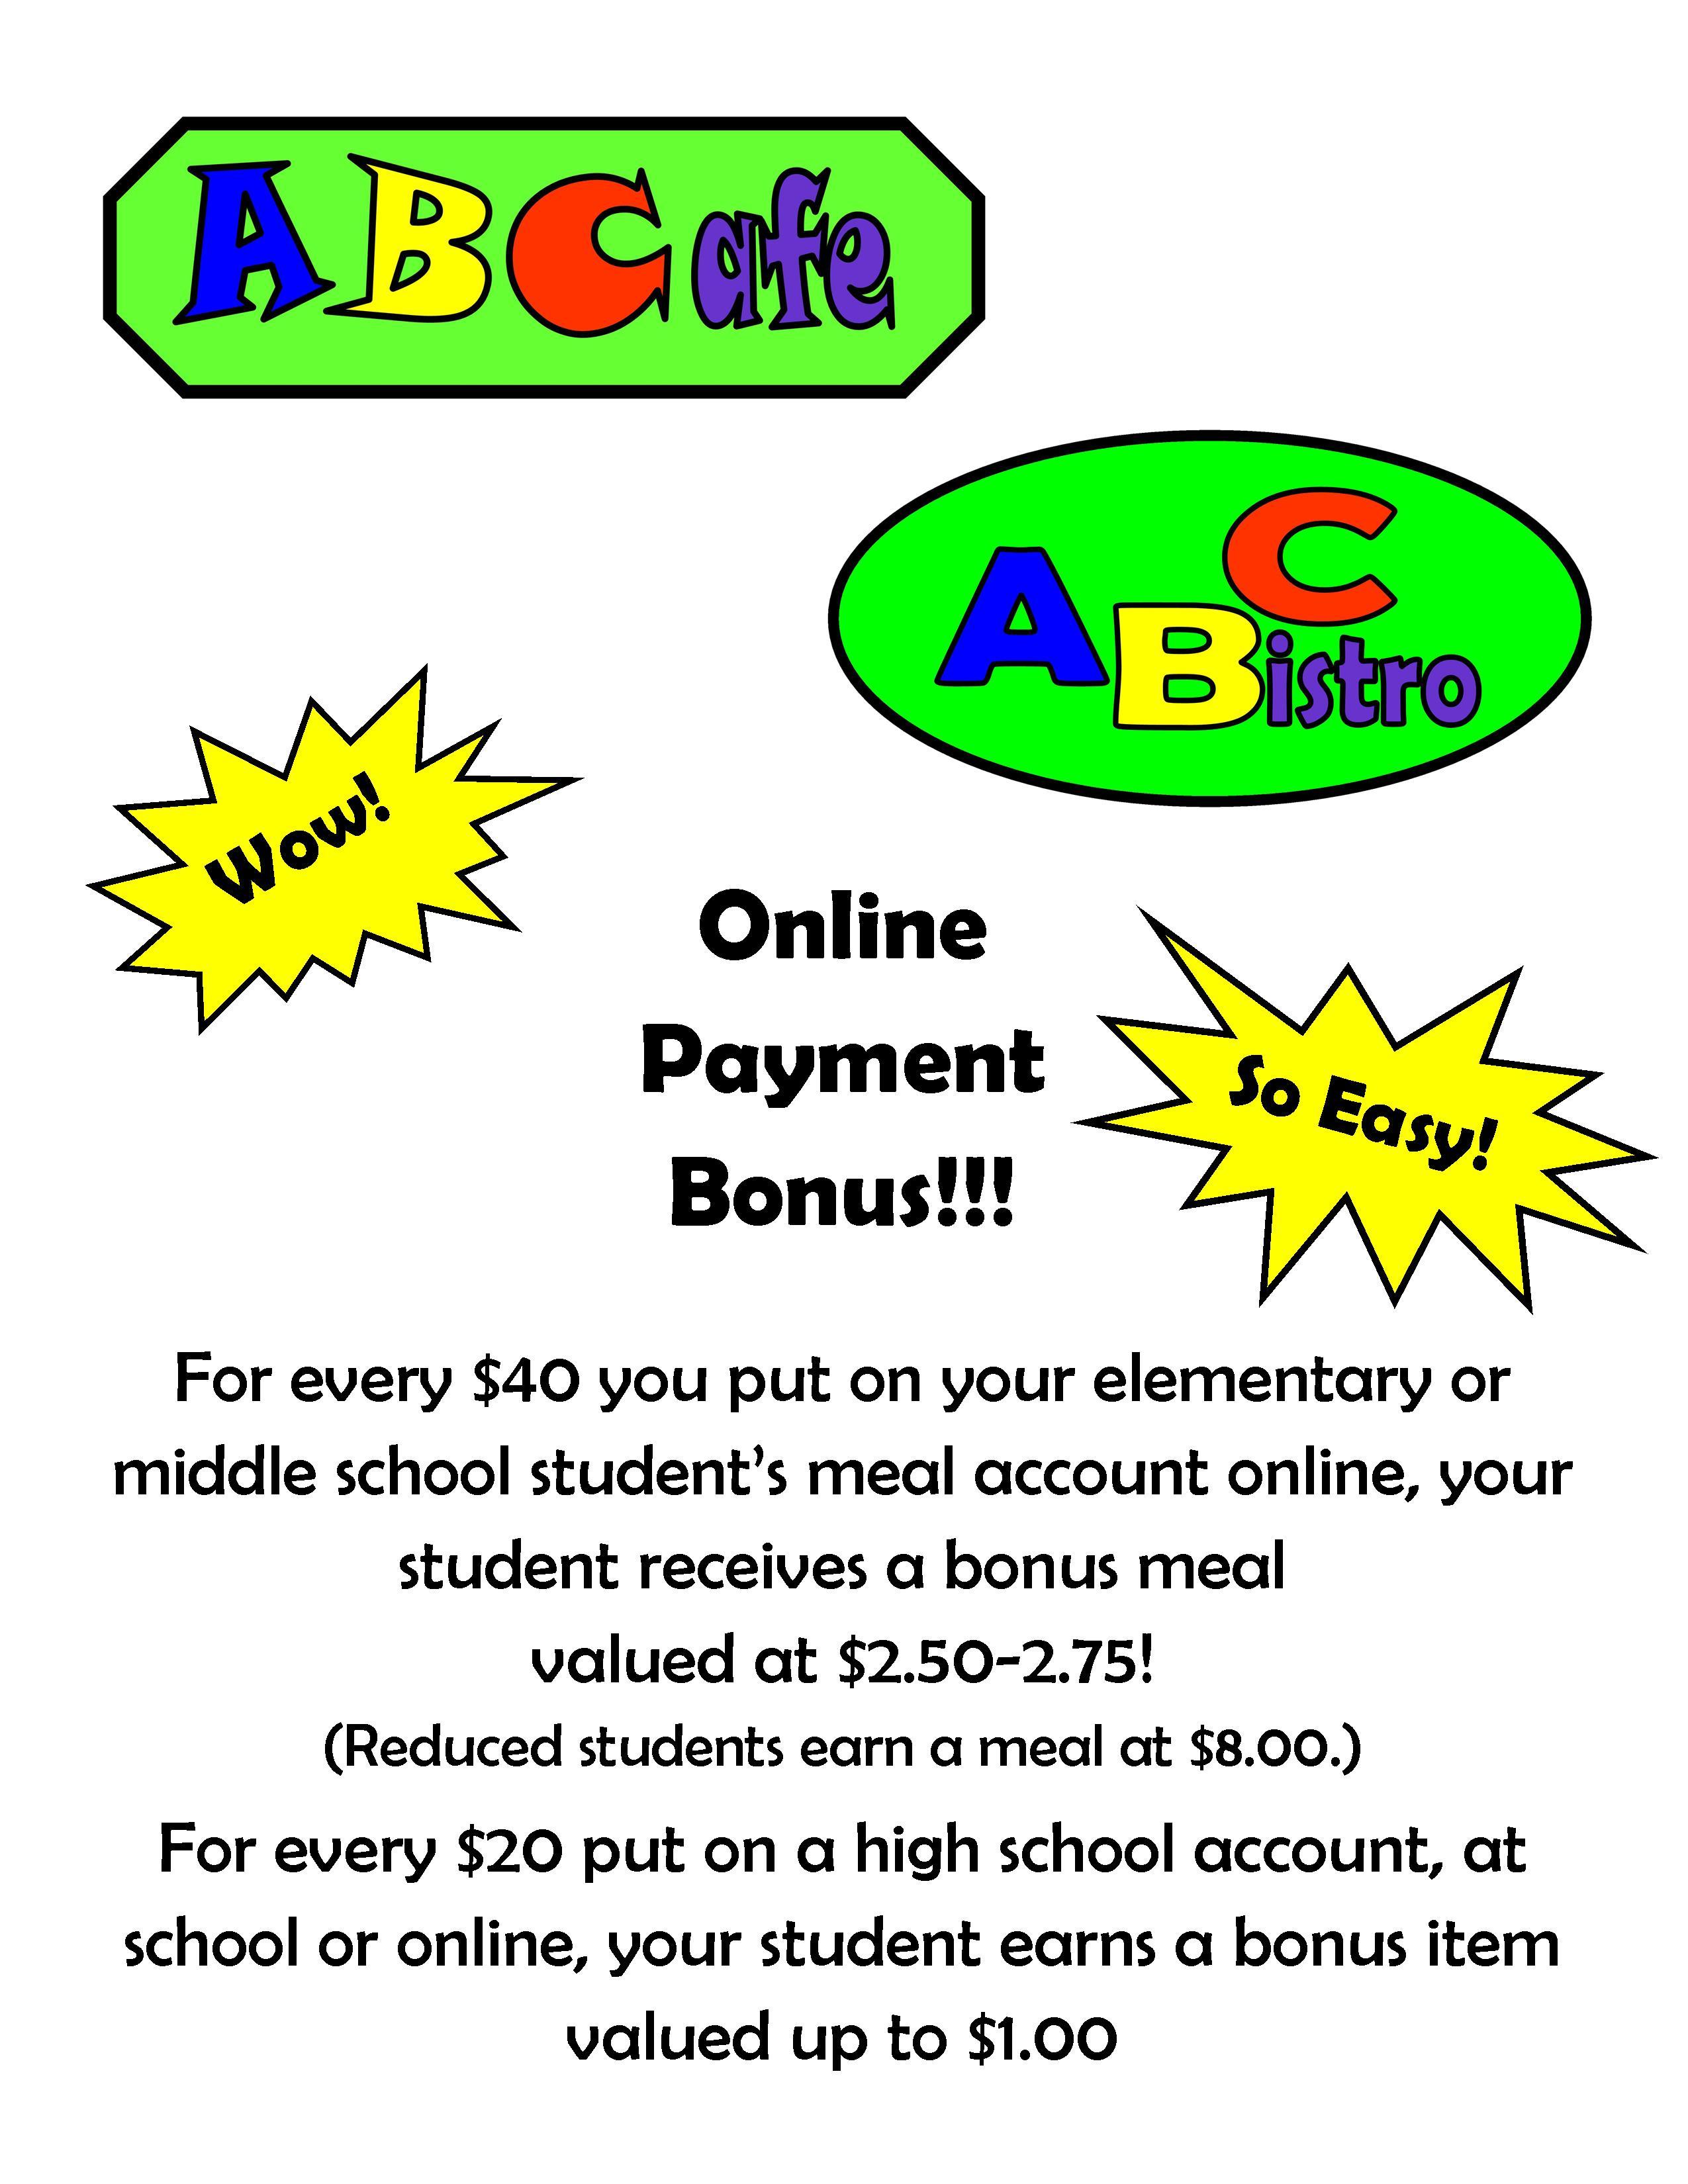 Online_Payment_Bonus.jpg